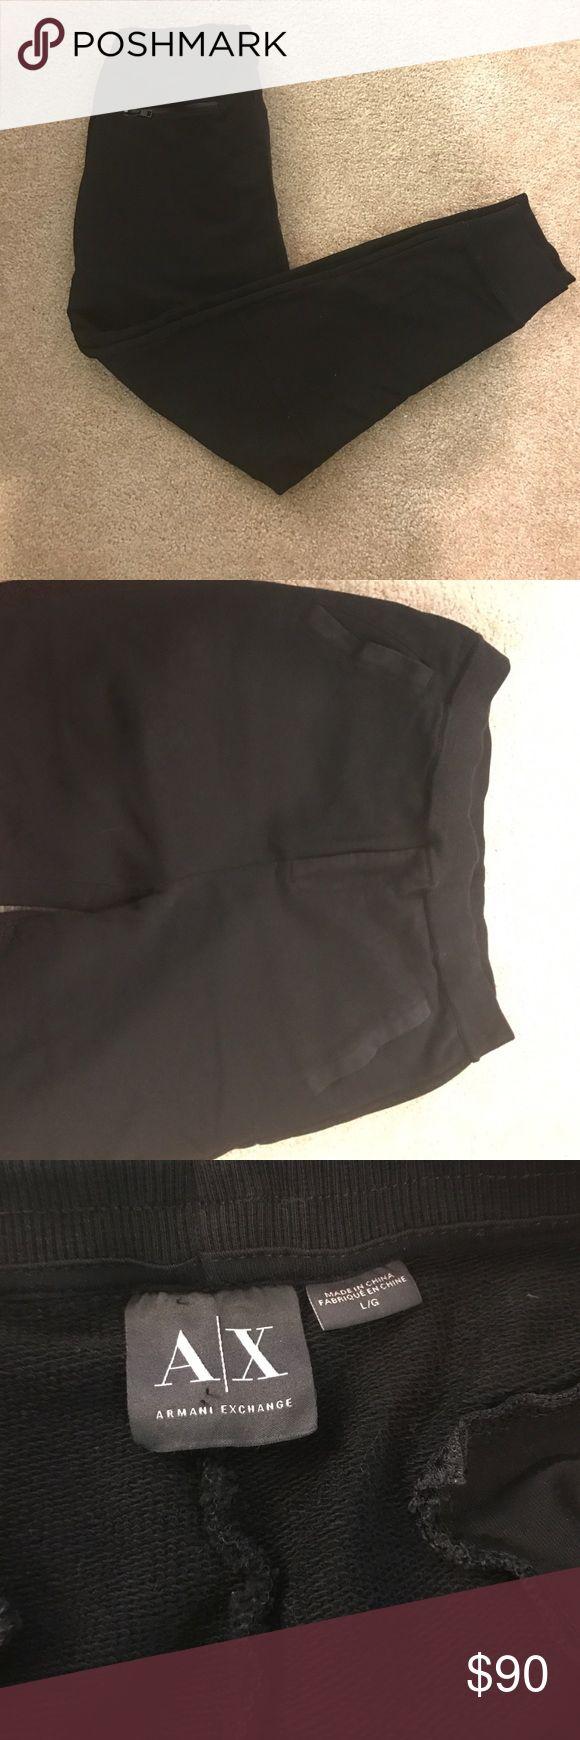 ✔️Armani Exchange Men's black sweatpants pants✔️ For sale Armani Exchange black sweatpants,with pockets,new without tags!! A/X Armani Exchange Pants Sweatpants & Joggers